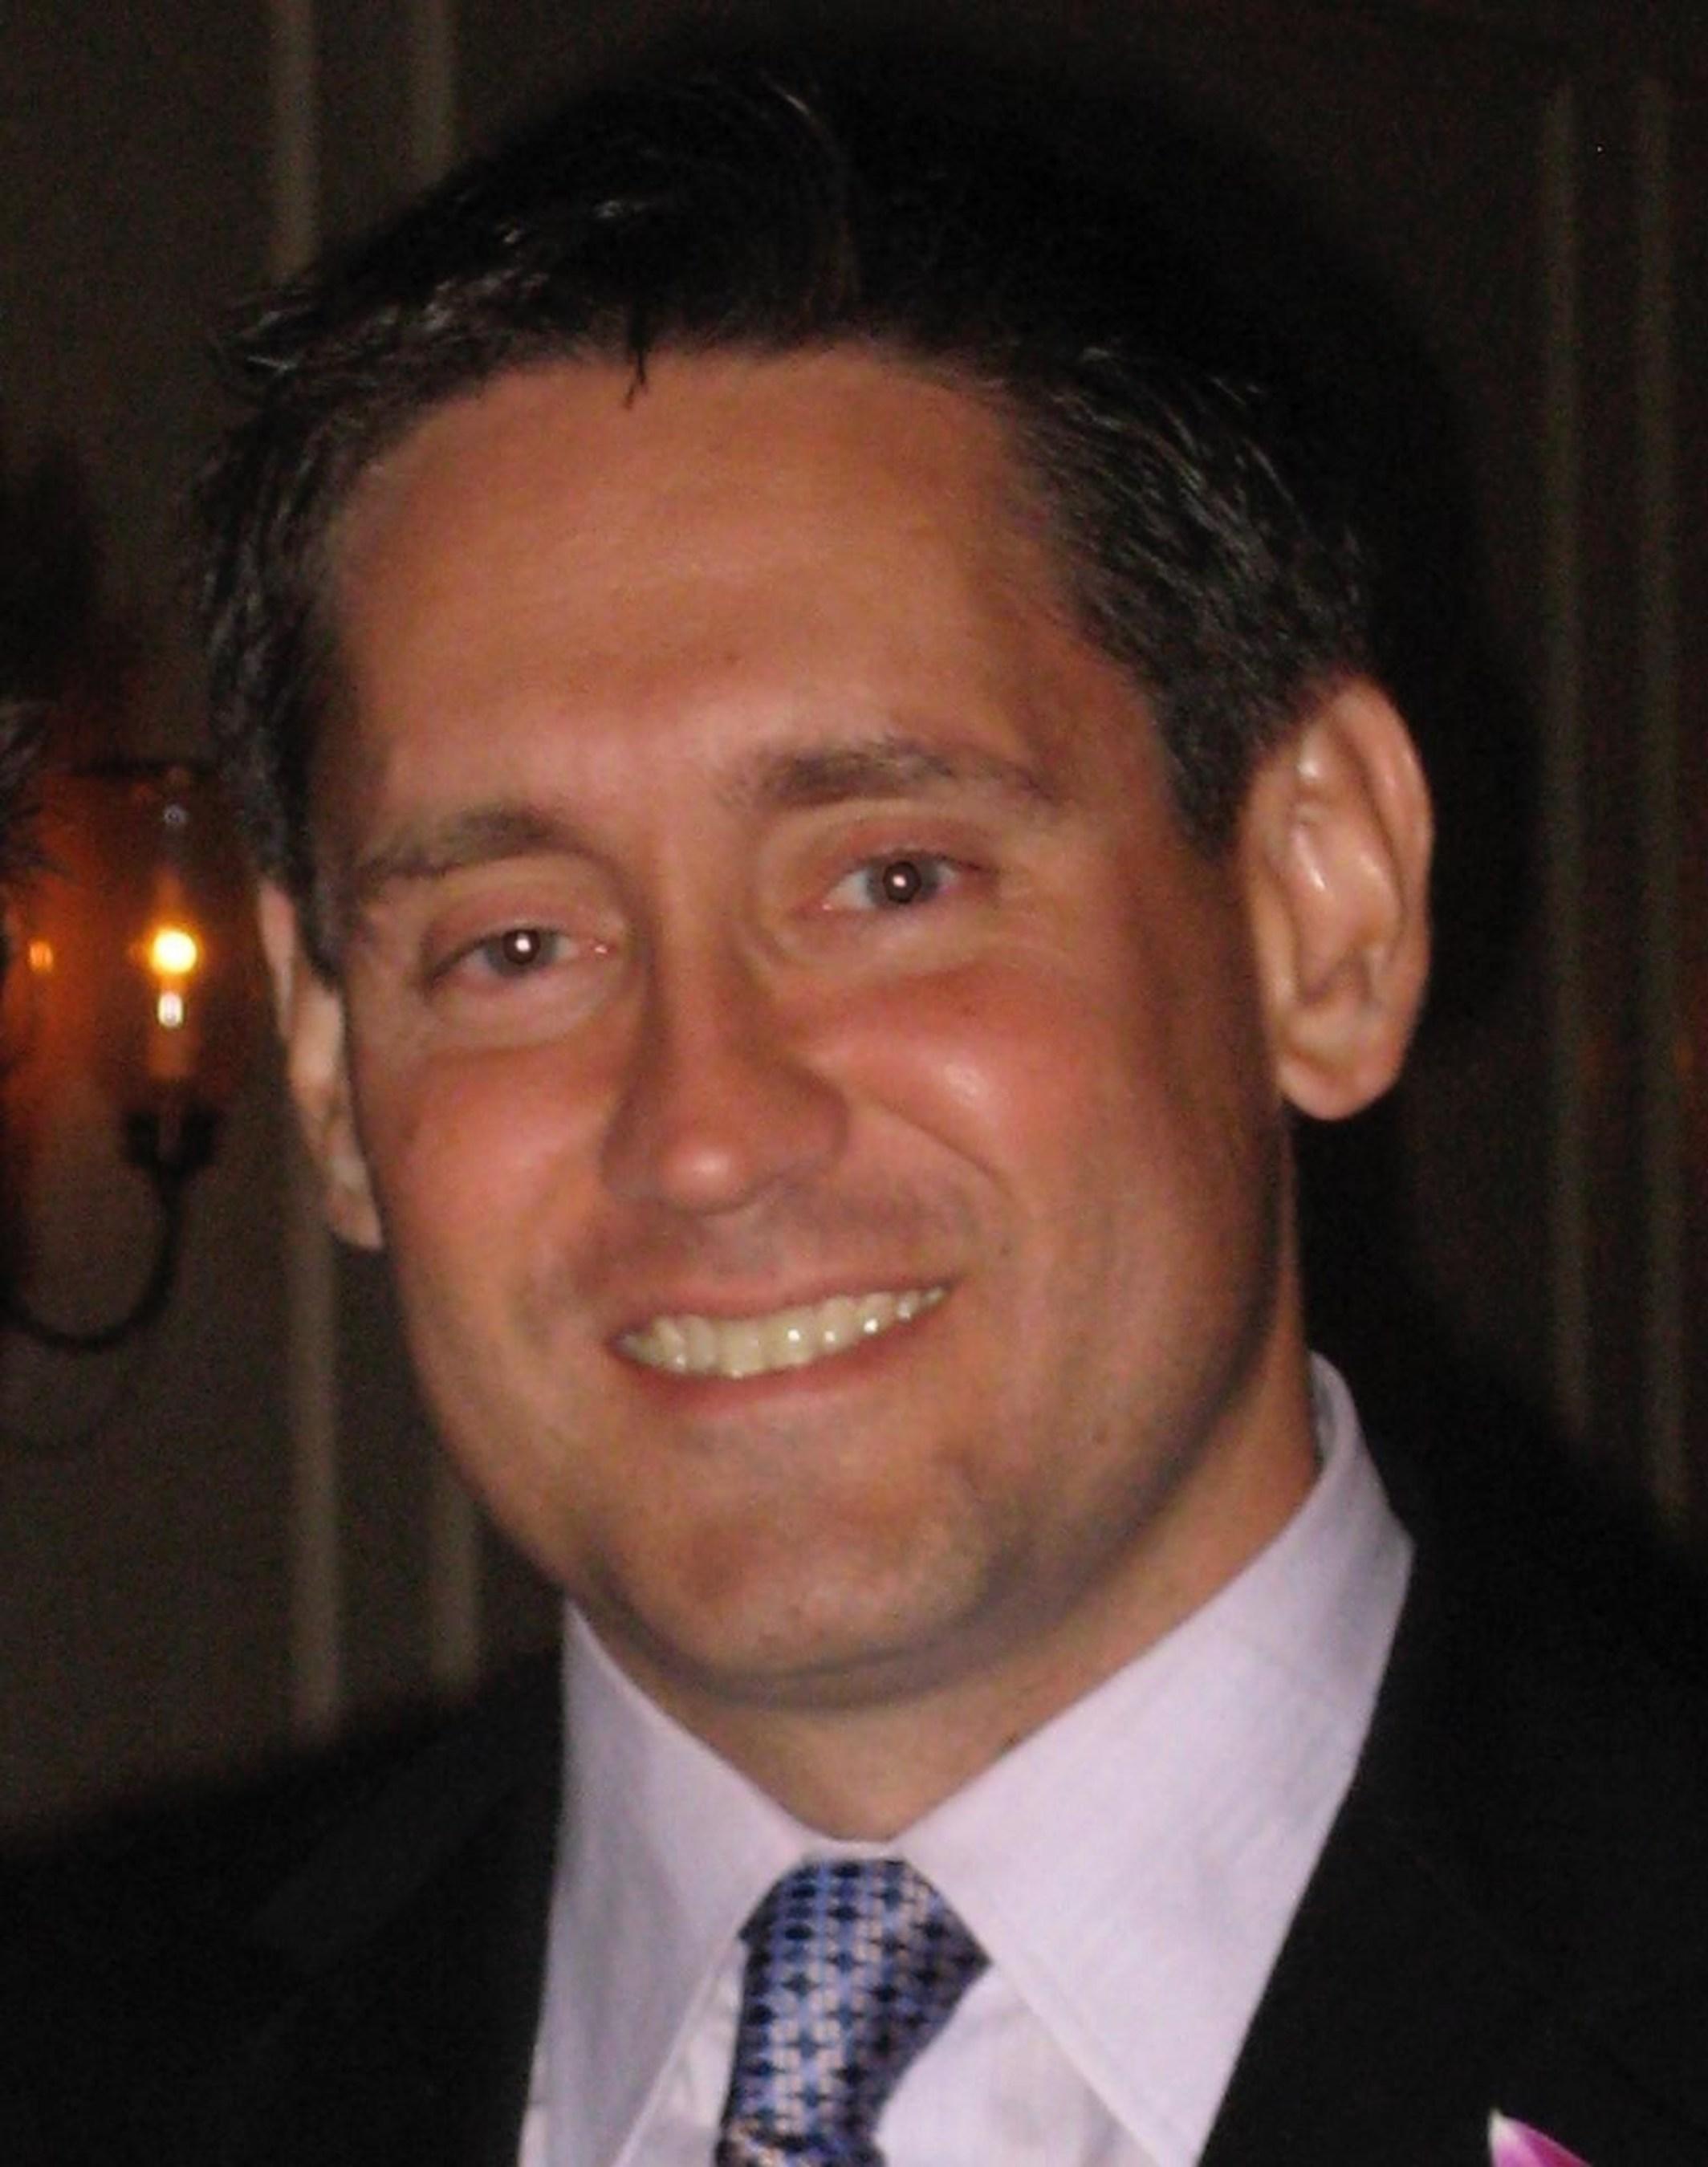 Zumobi VP of East Coast Sales, John McCormick